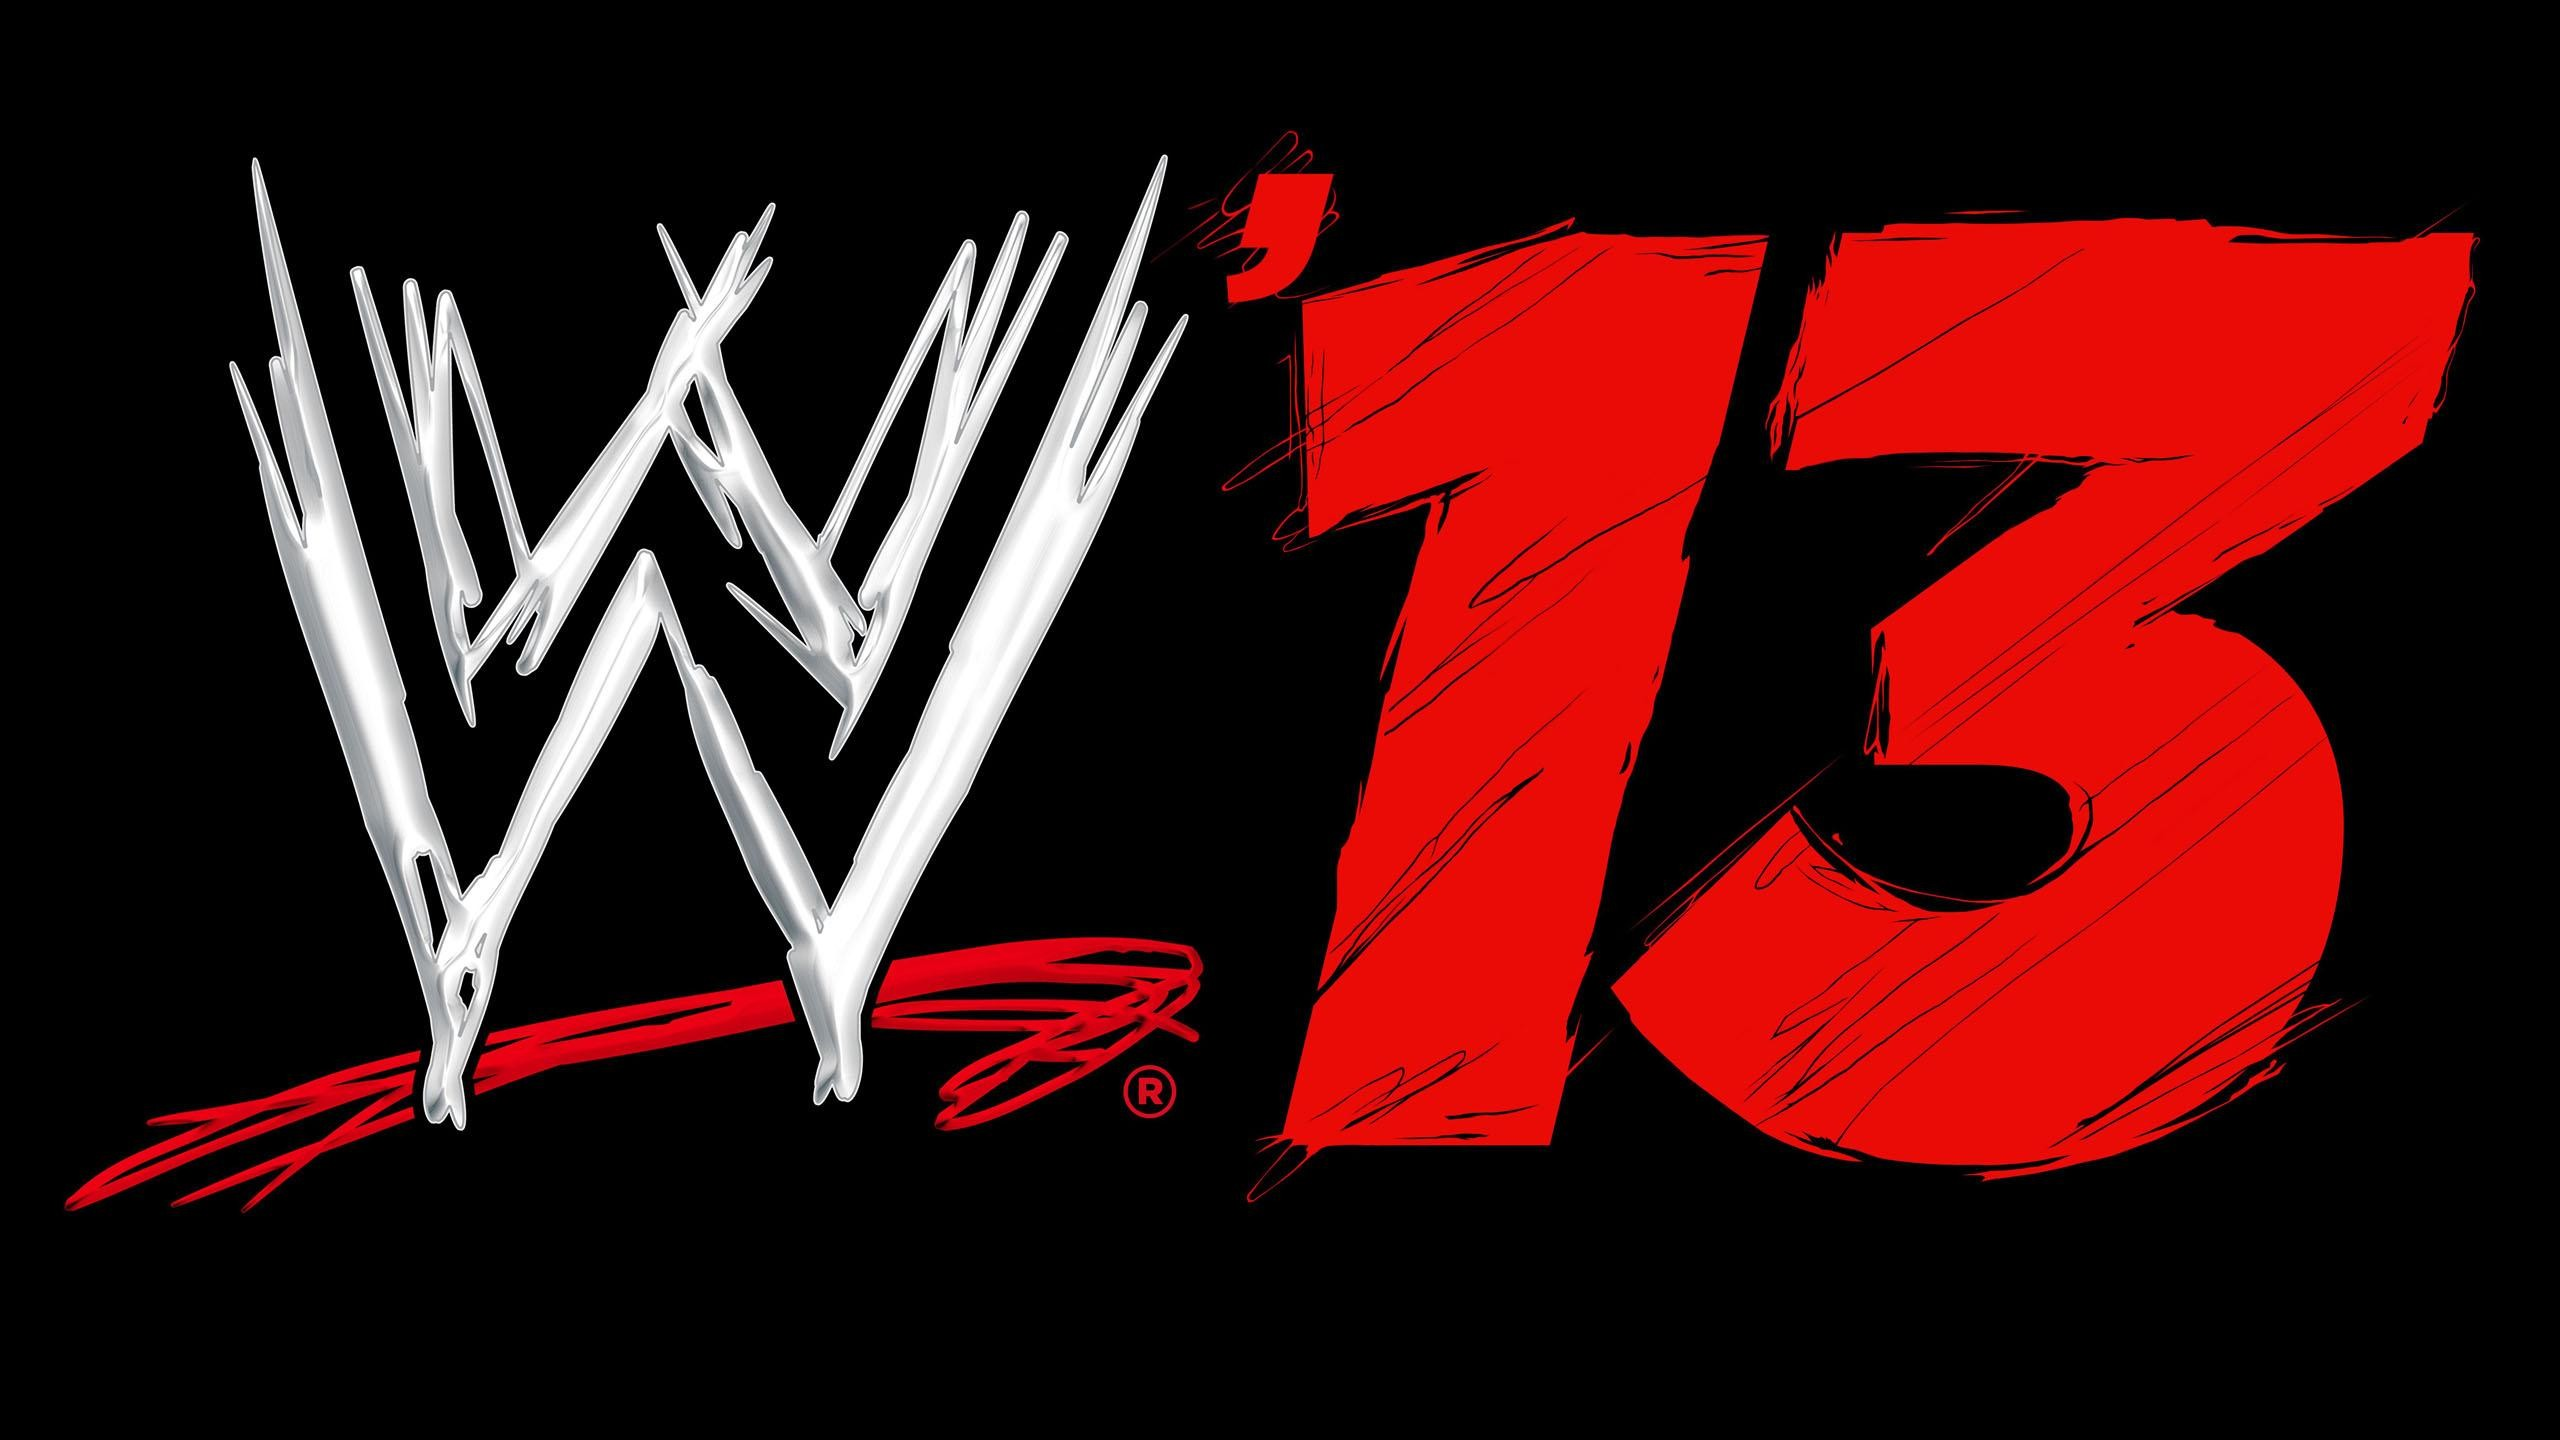 WWE-logo-black-skiing-freestyle-resolution-HD-wallpapers